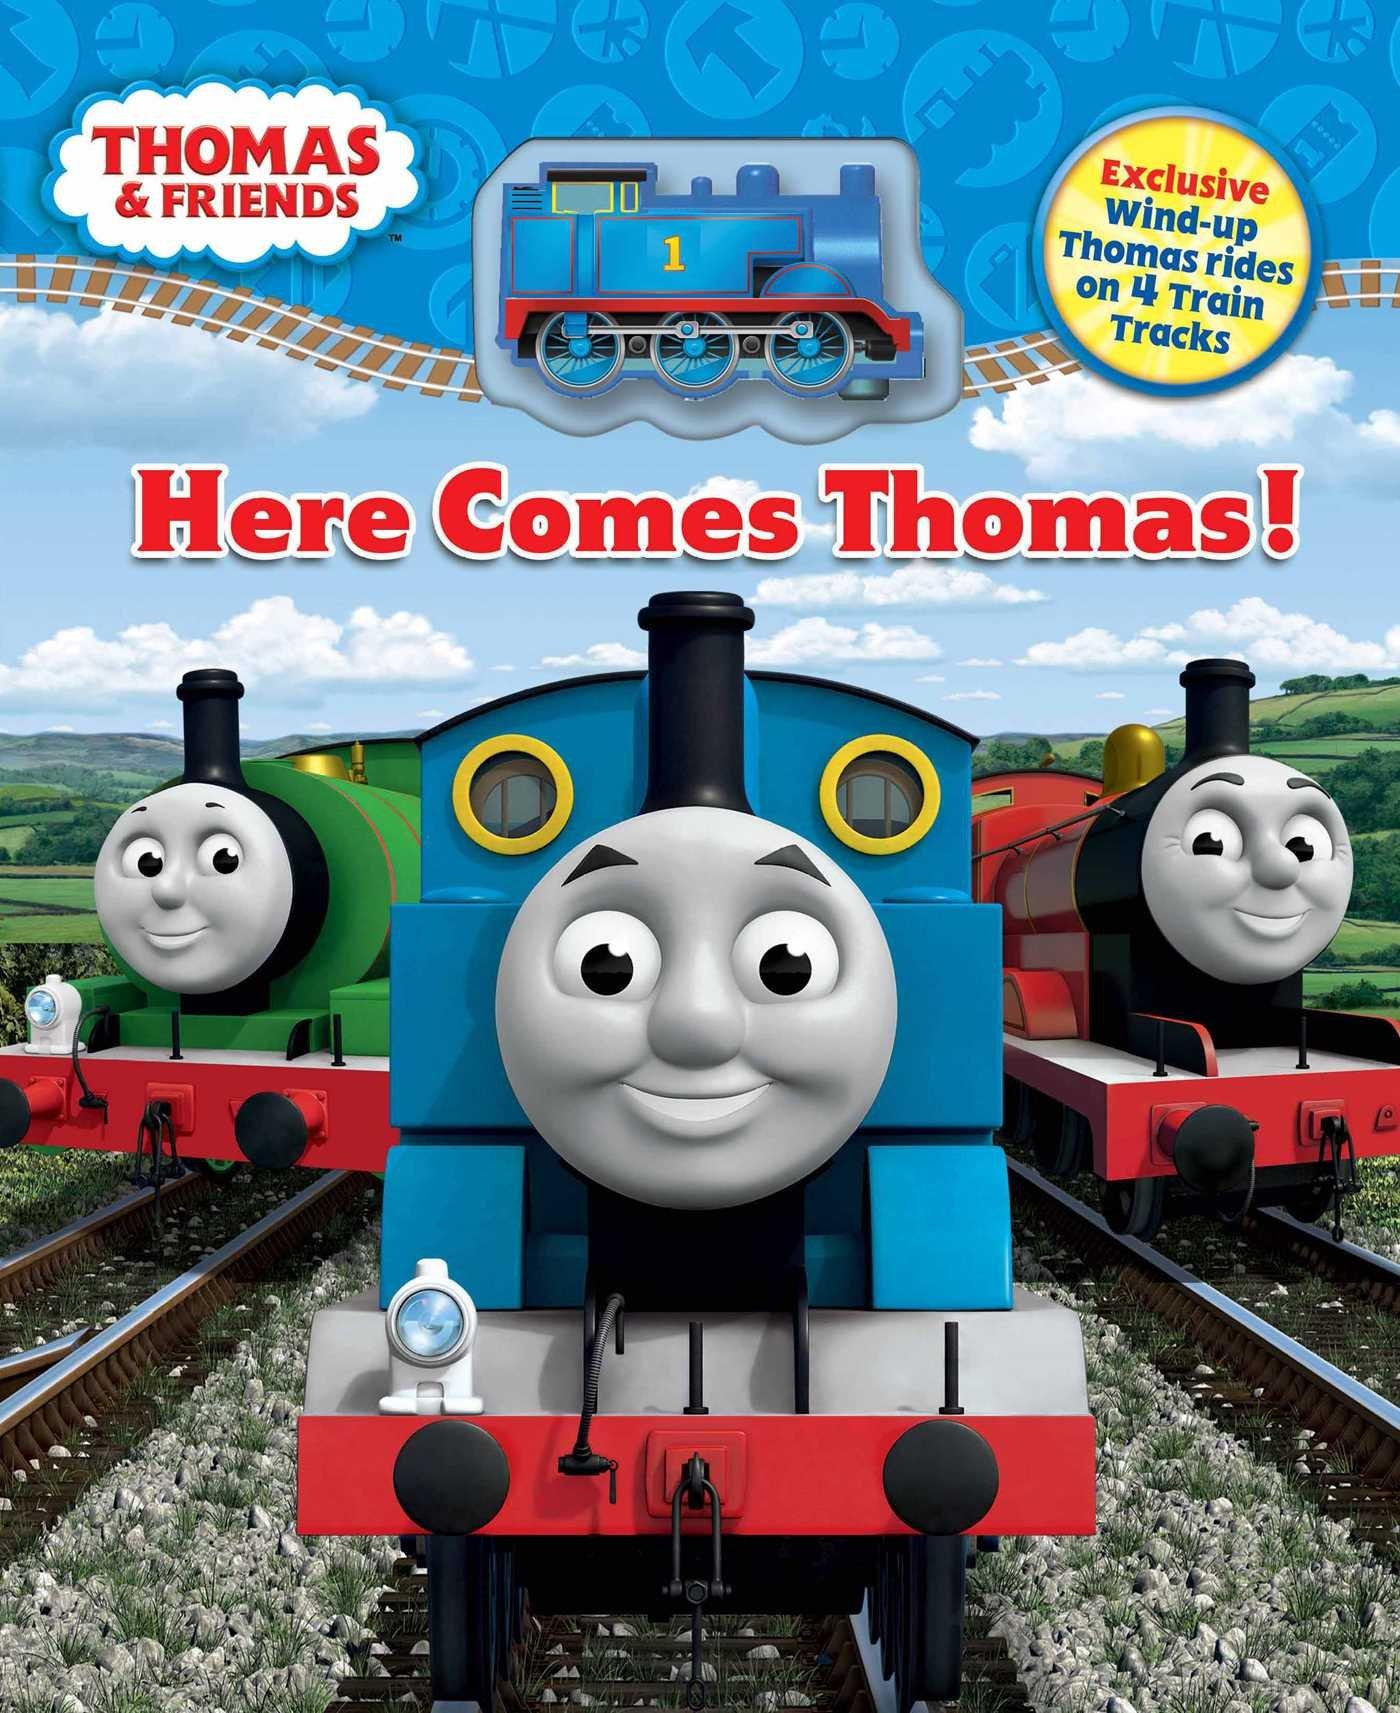 Thomas & Friends: Here Comes Thomas!